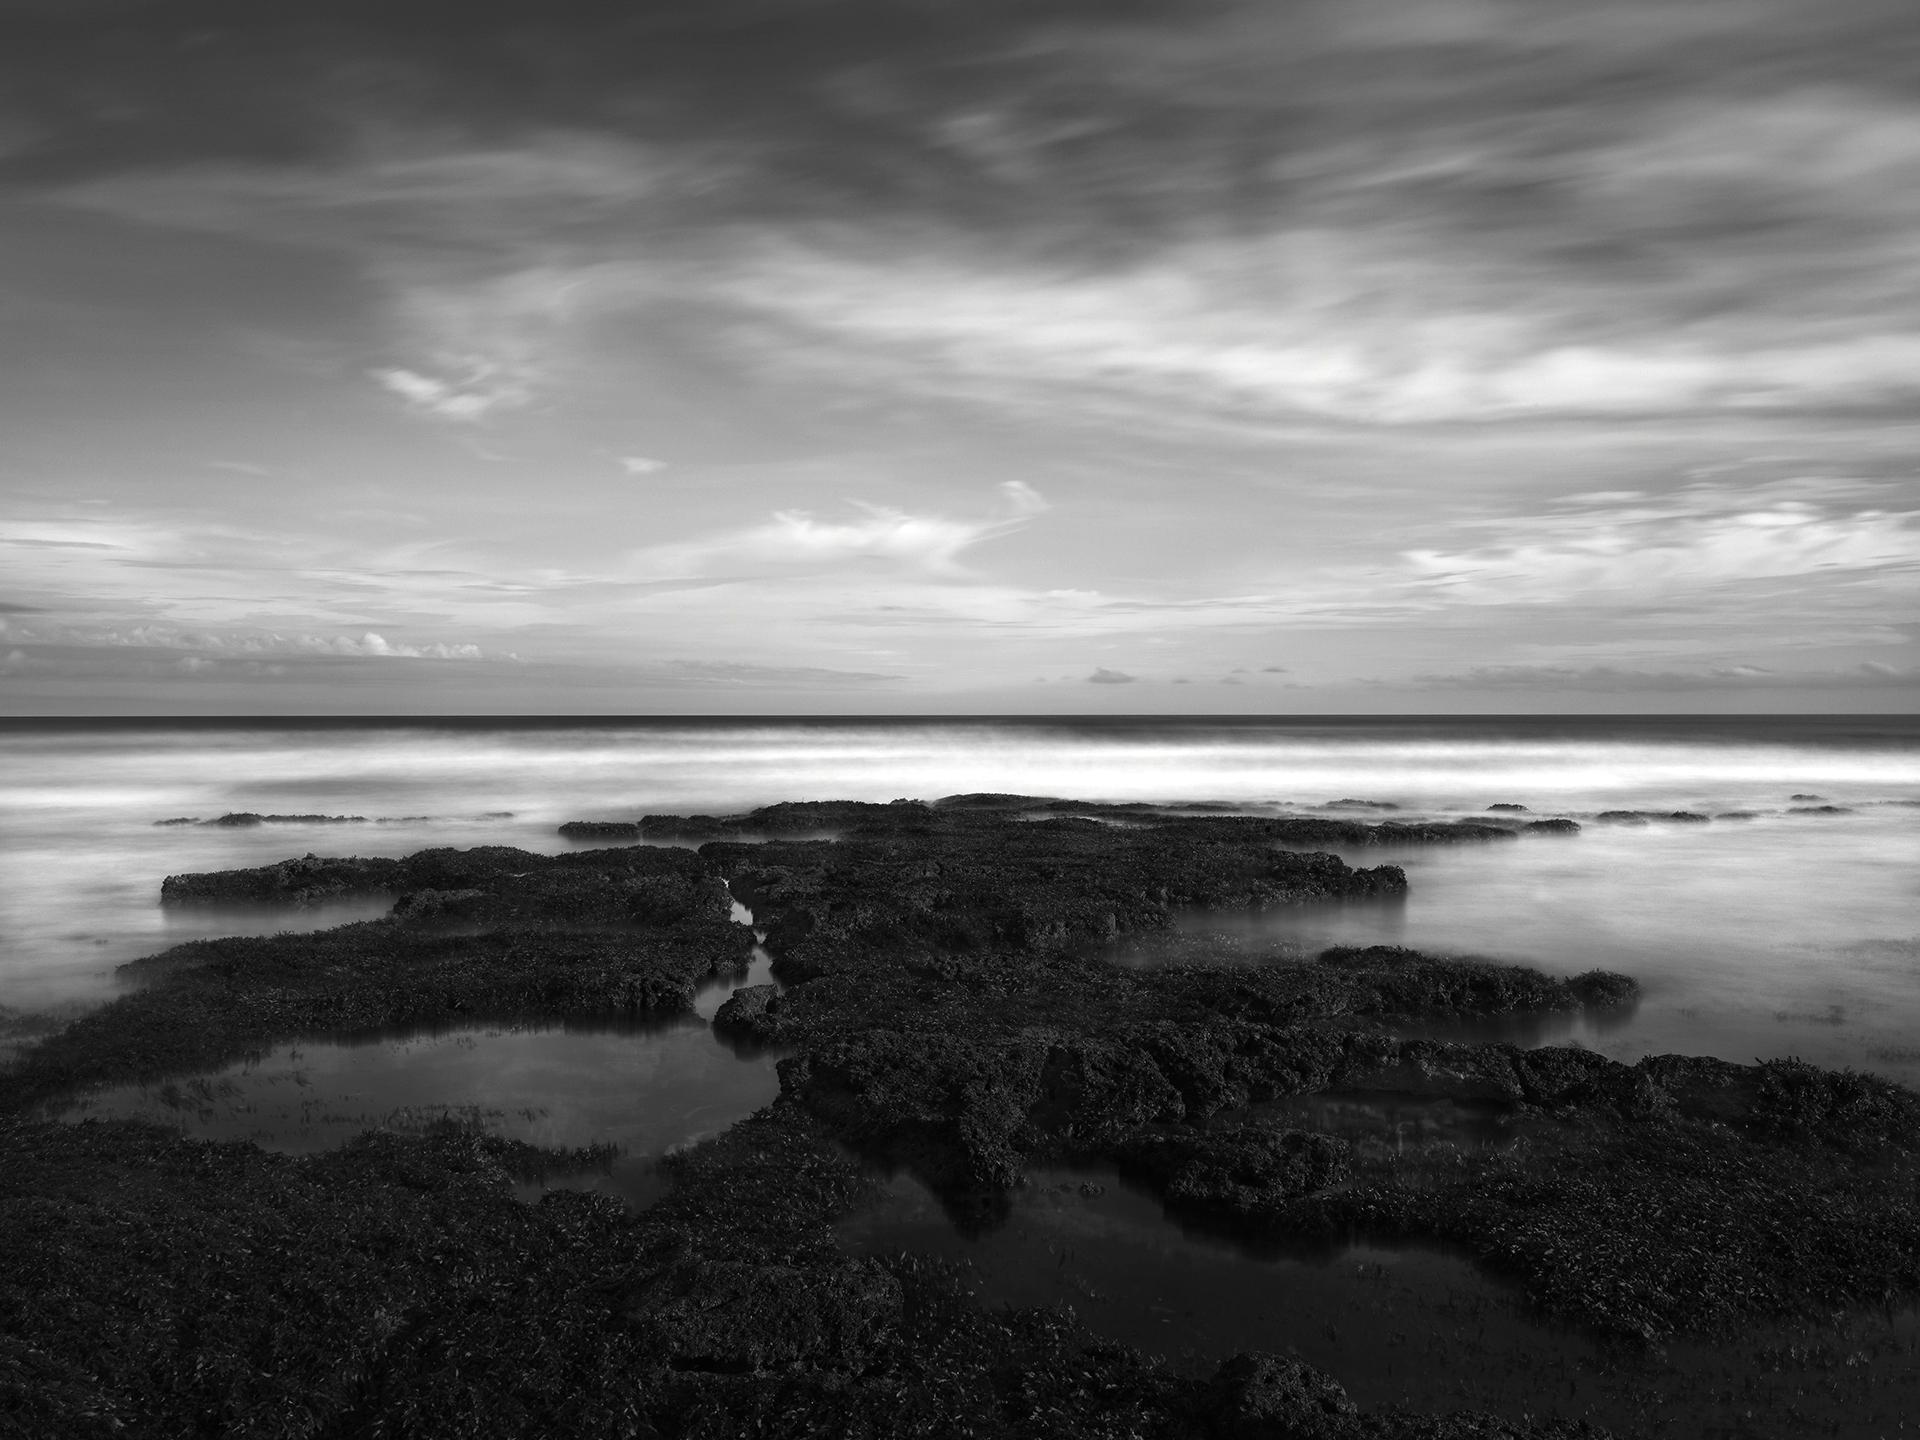 Low Tide Rising, Bali, Indonesia - 2010 copy.jpg